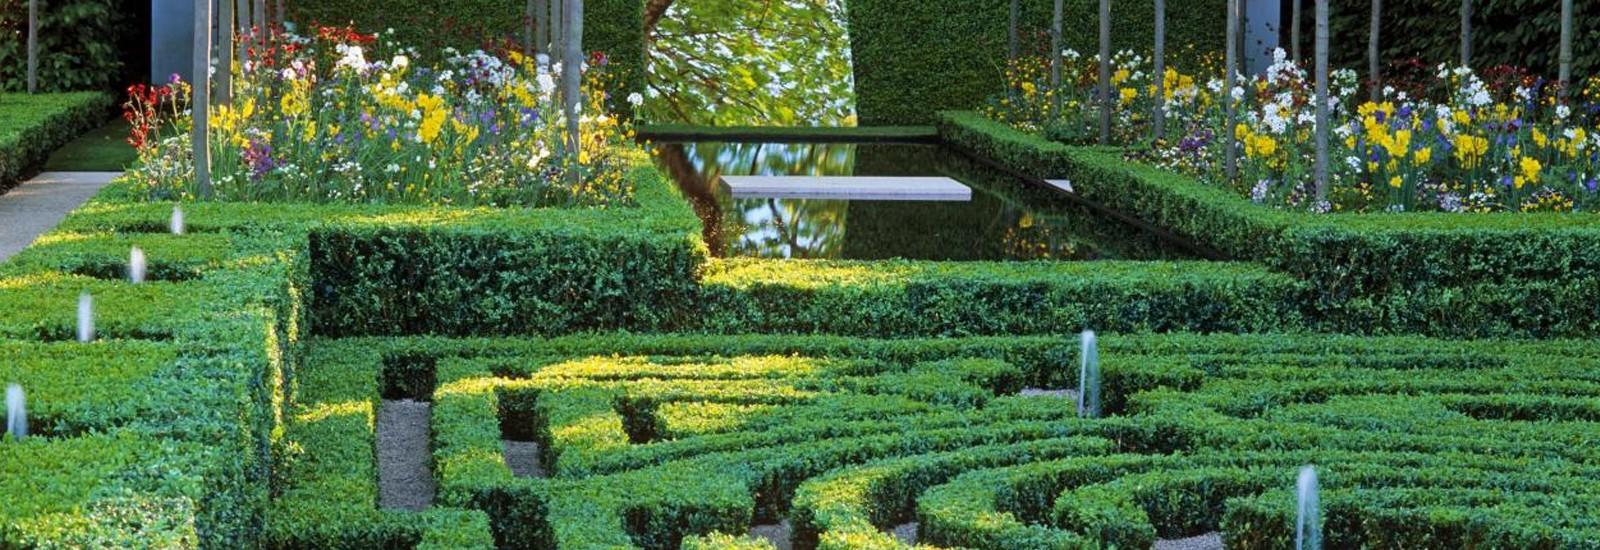 Ogród-formalny